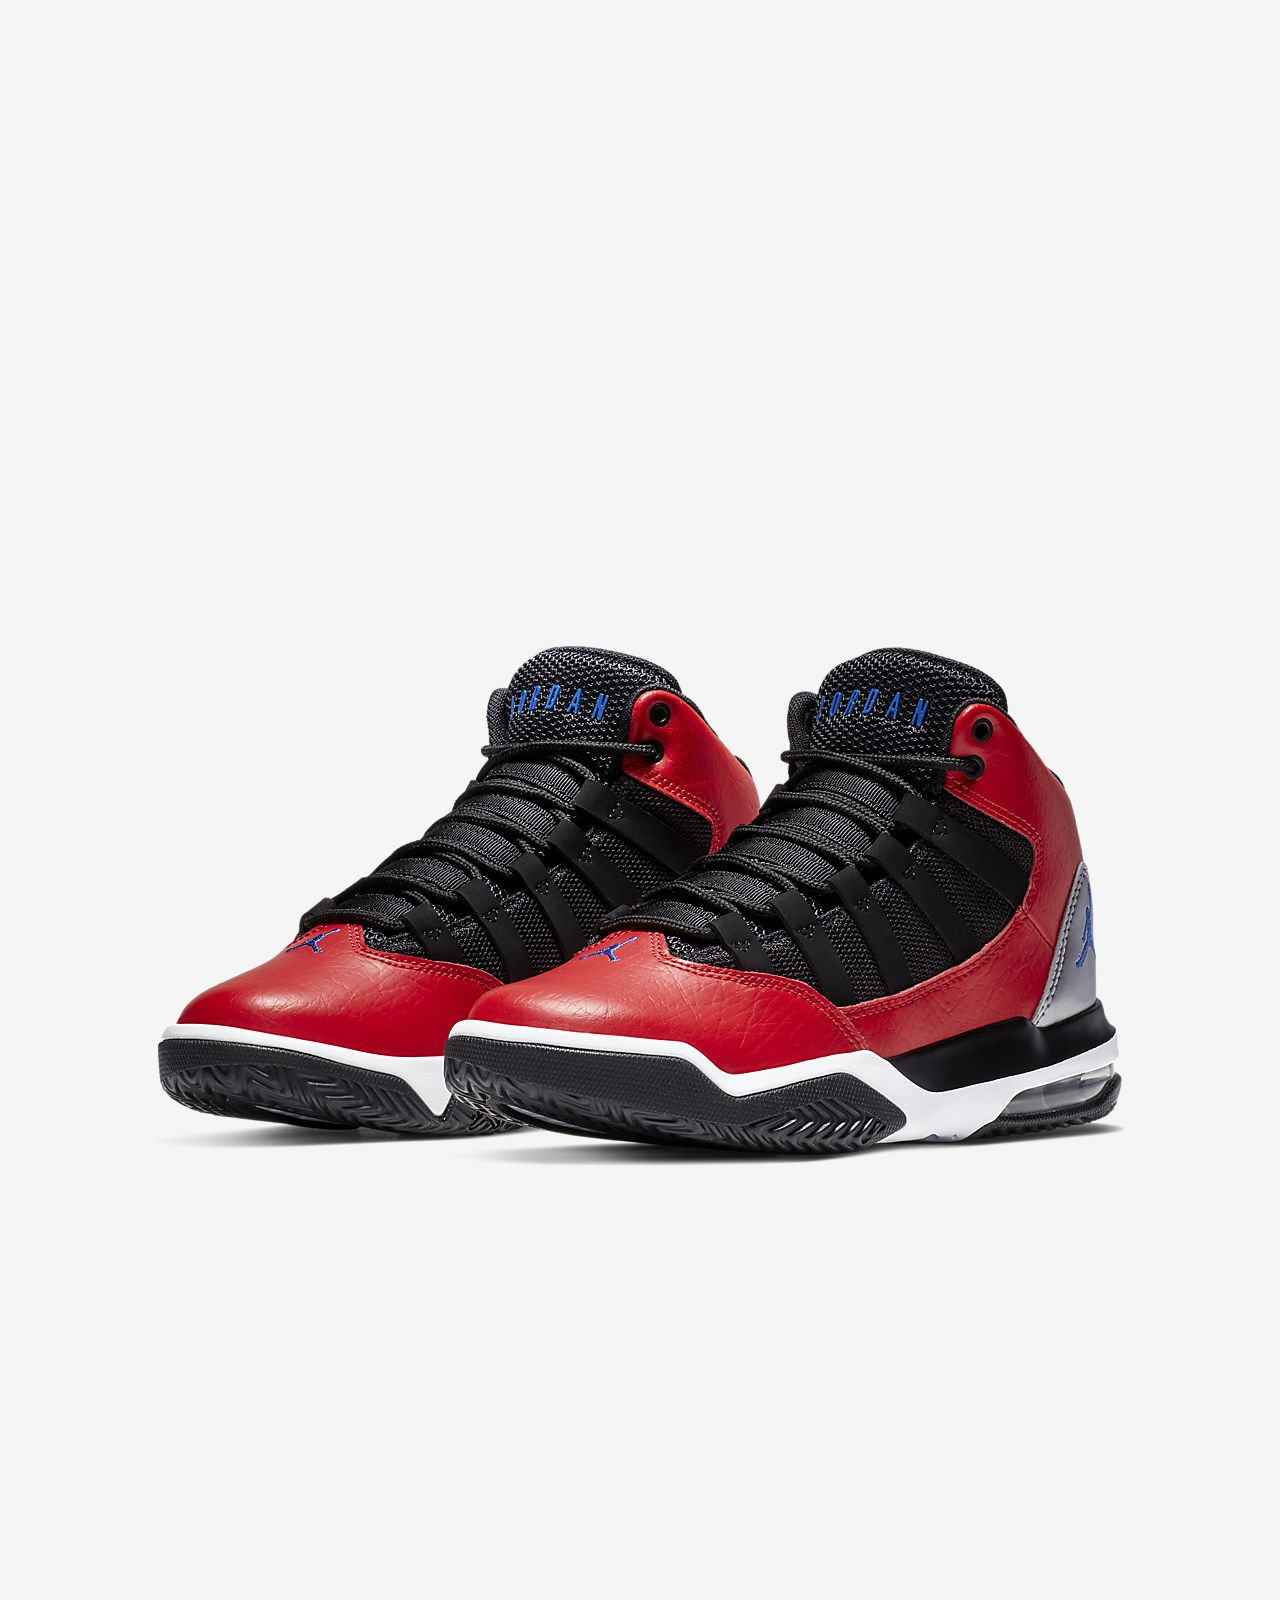 reputable site 59e15 880cc ... Jordan Max Aura Older Kids  Shoe